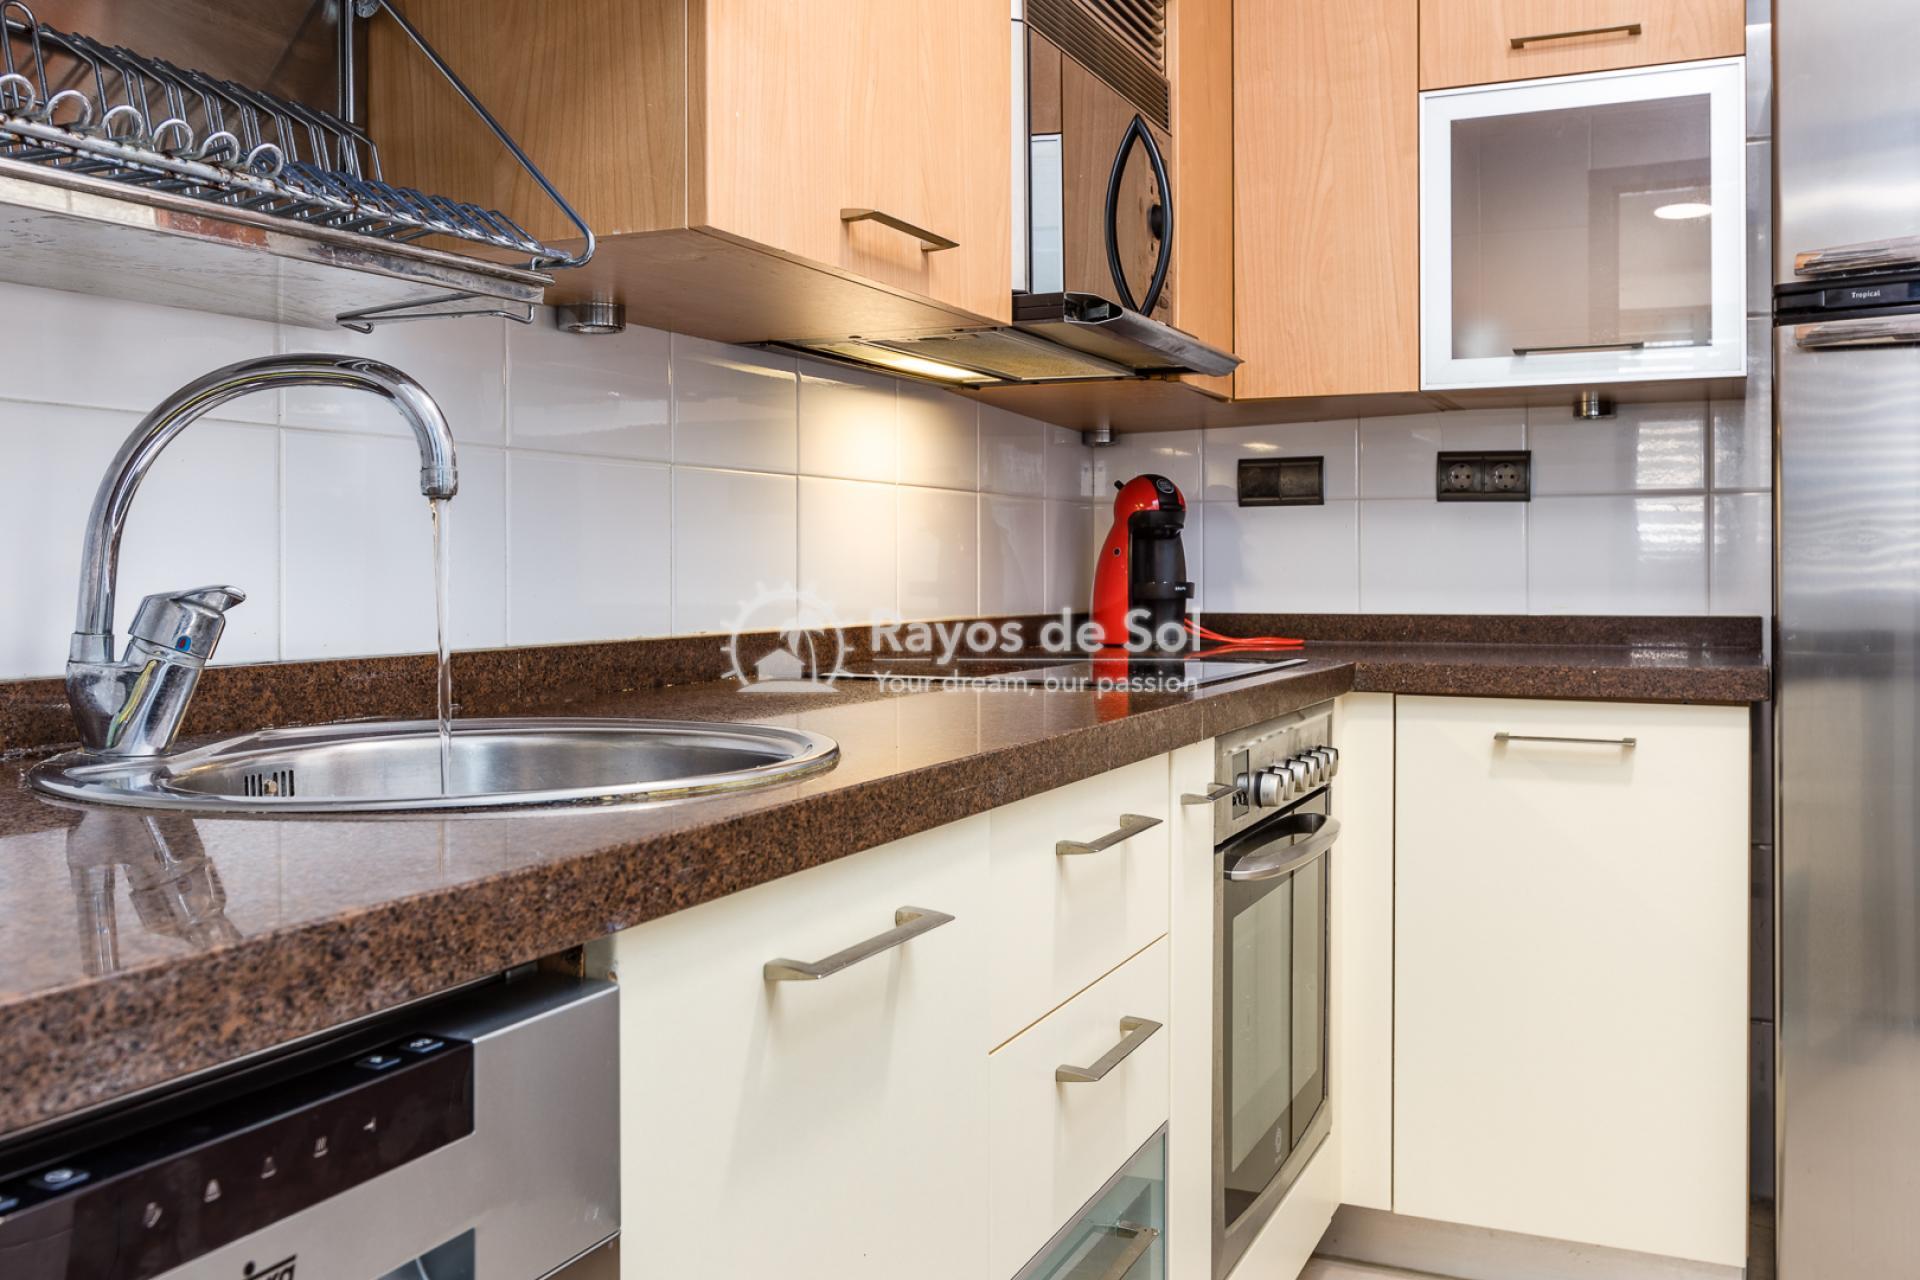 Turnekey first line apartments  in Altea, Costa Blanca (Alteabeach) - 22